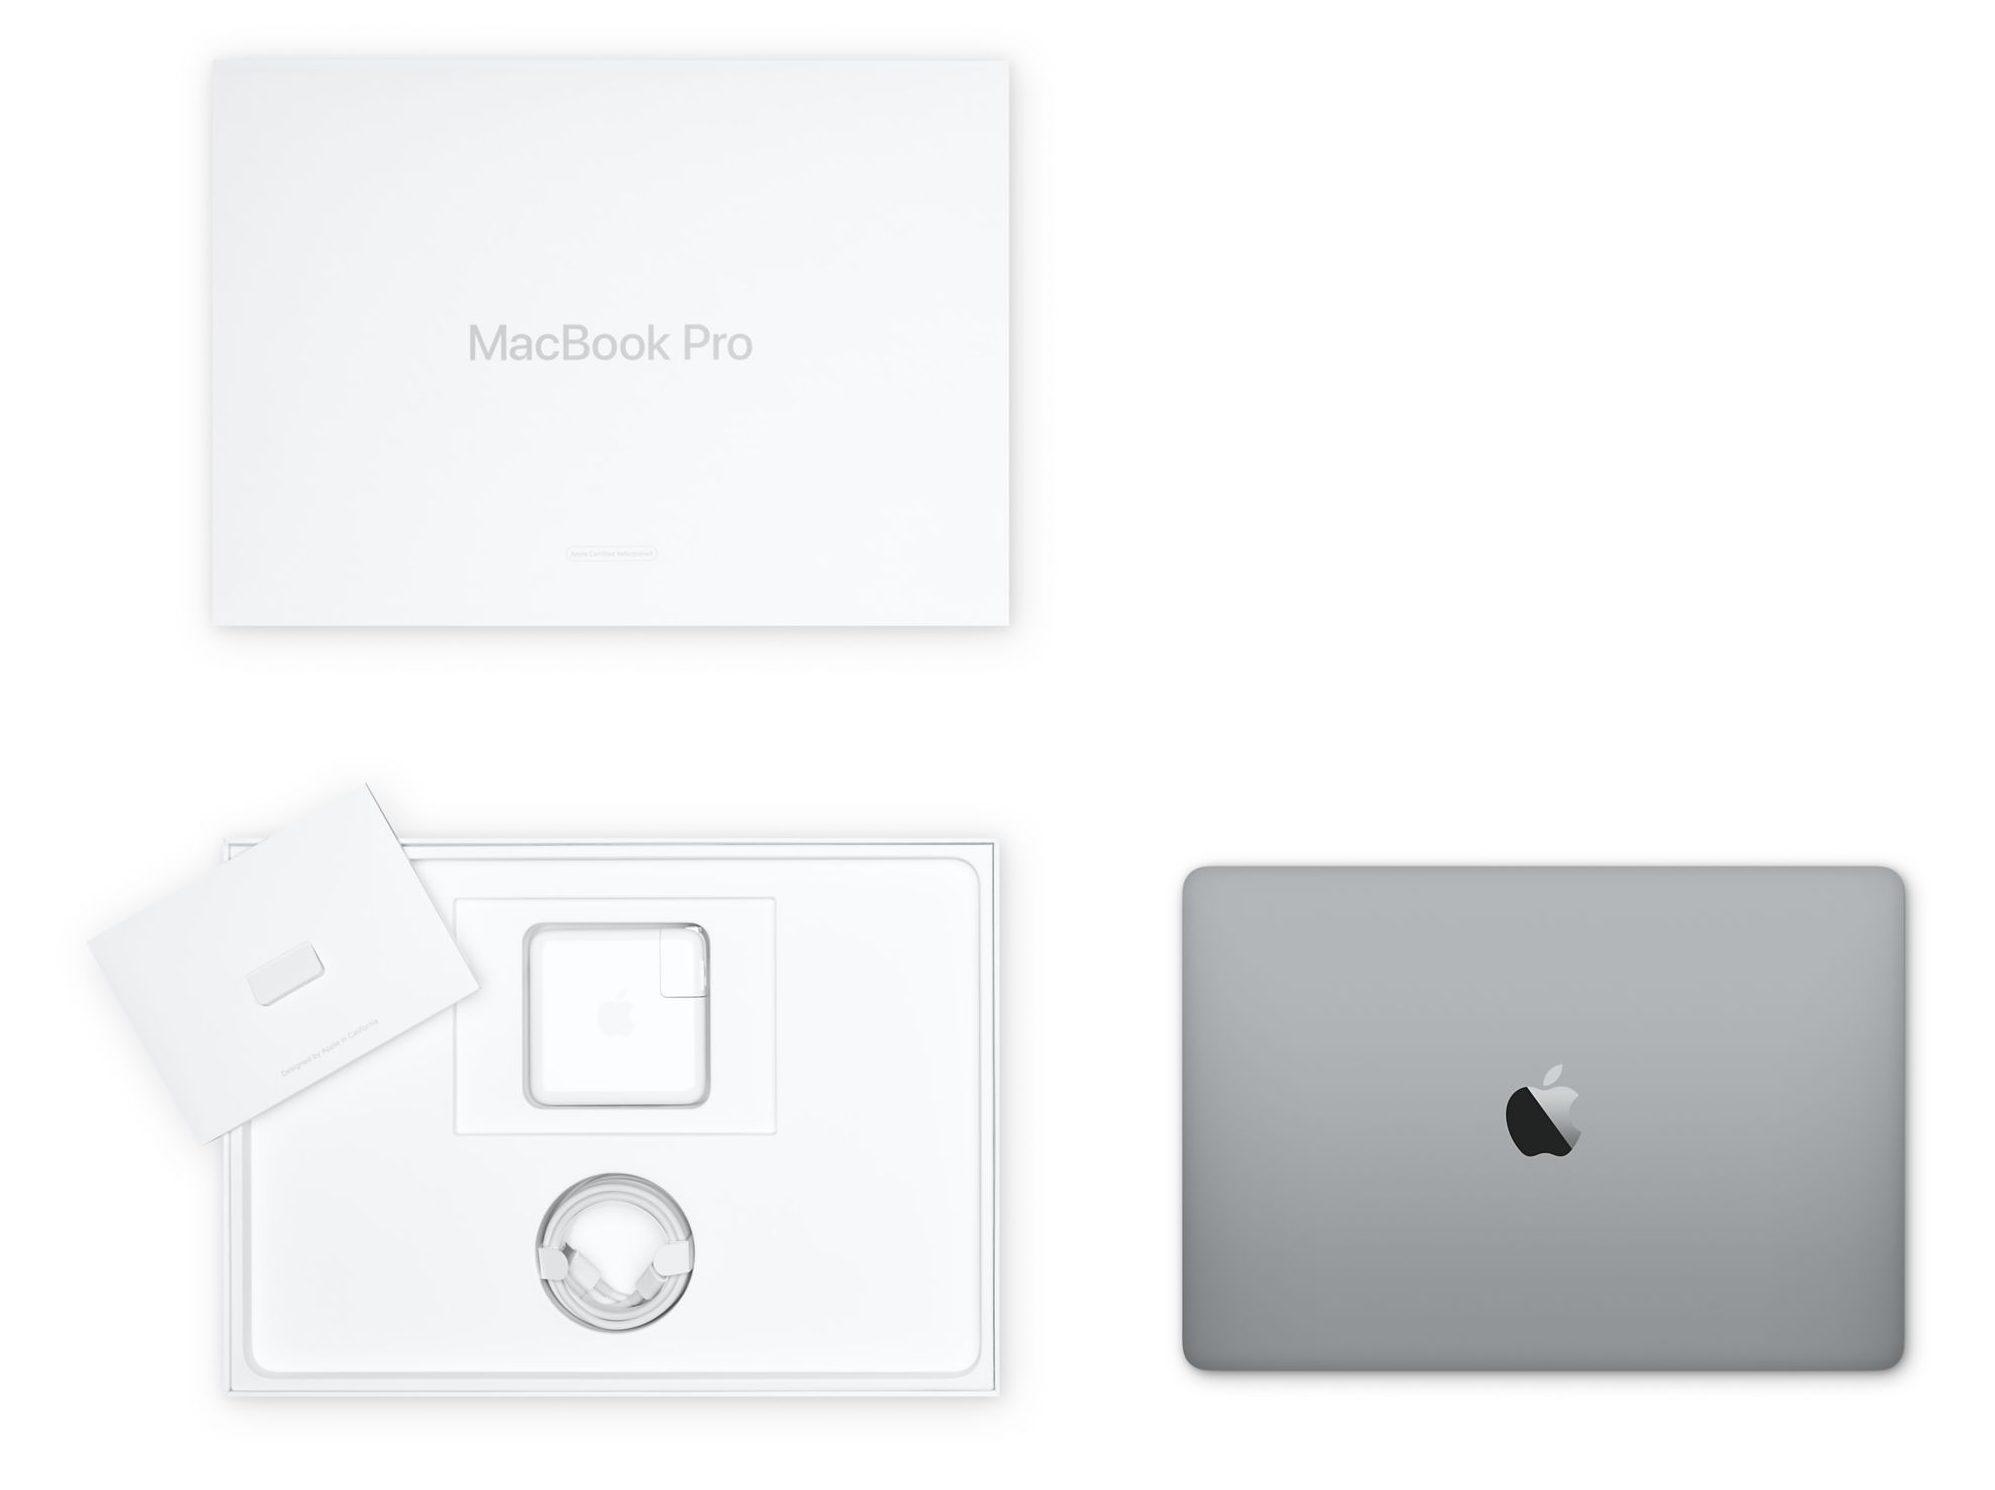 Refurbished MacBook Pro with white box Australia